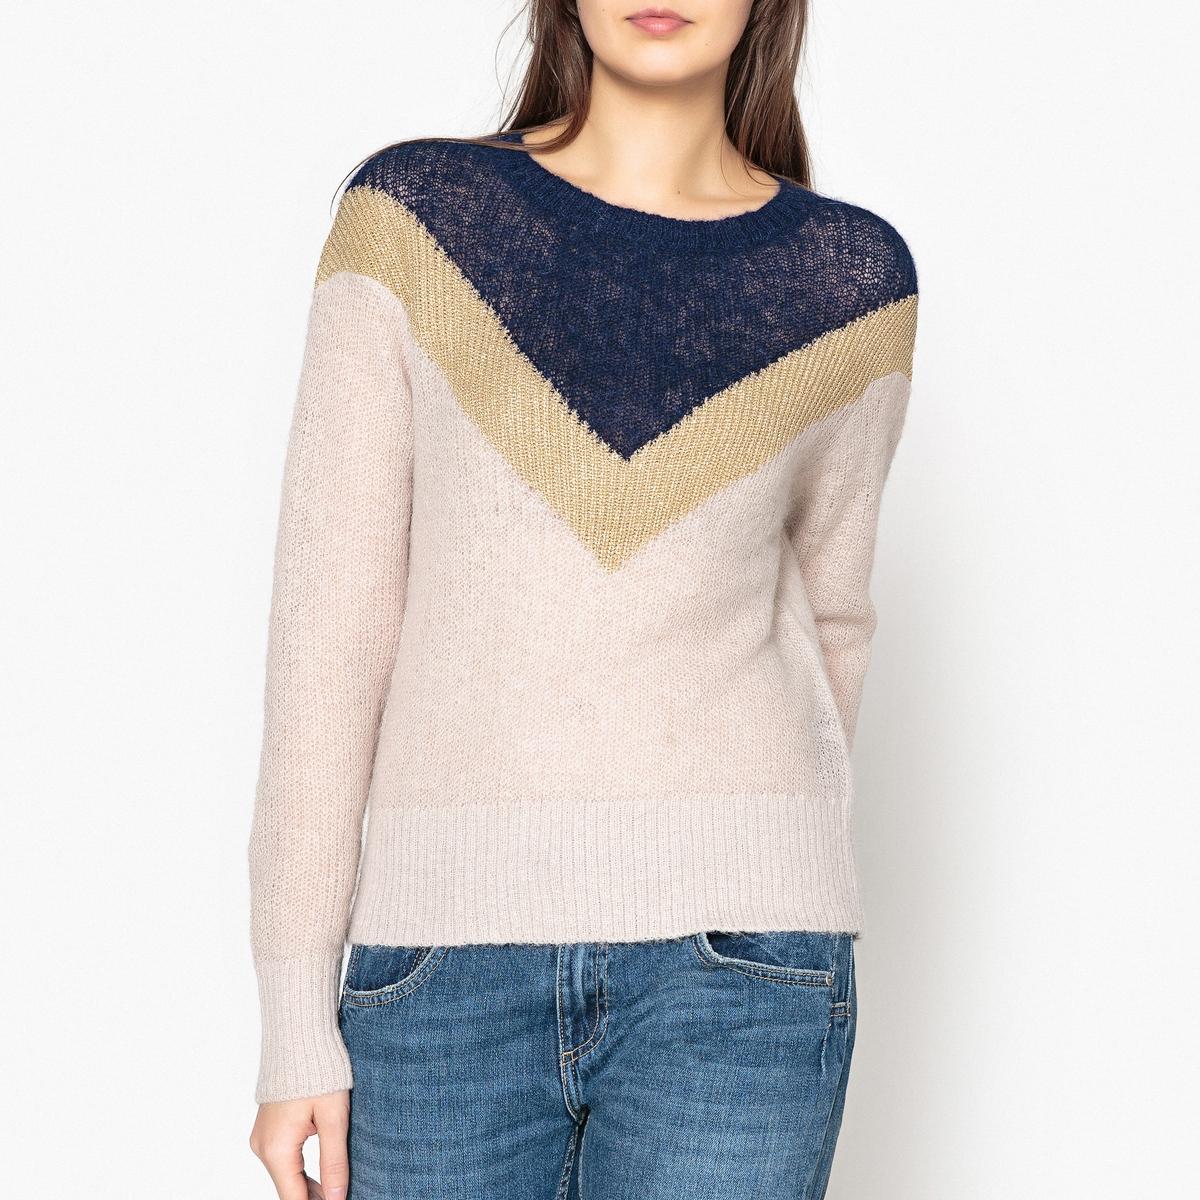 Пуловер из тонкого трикотажа с блестящей полосой MUSA YOKE от LEON and HARPER